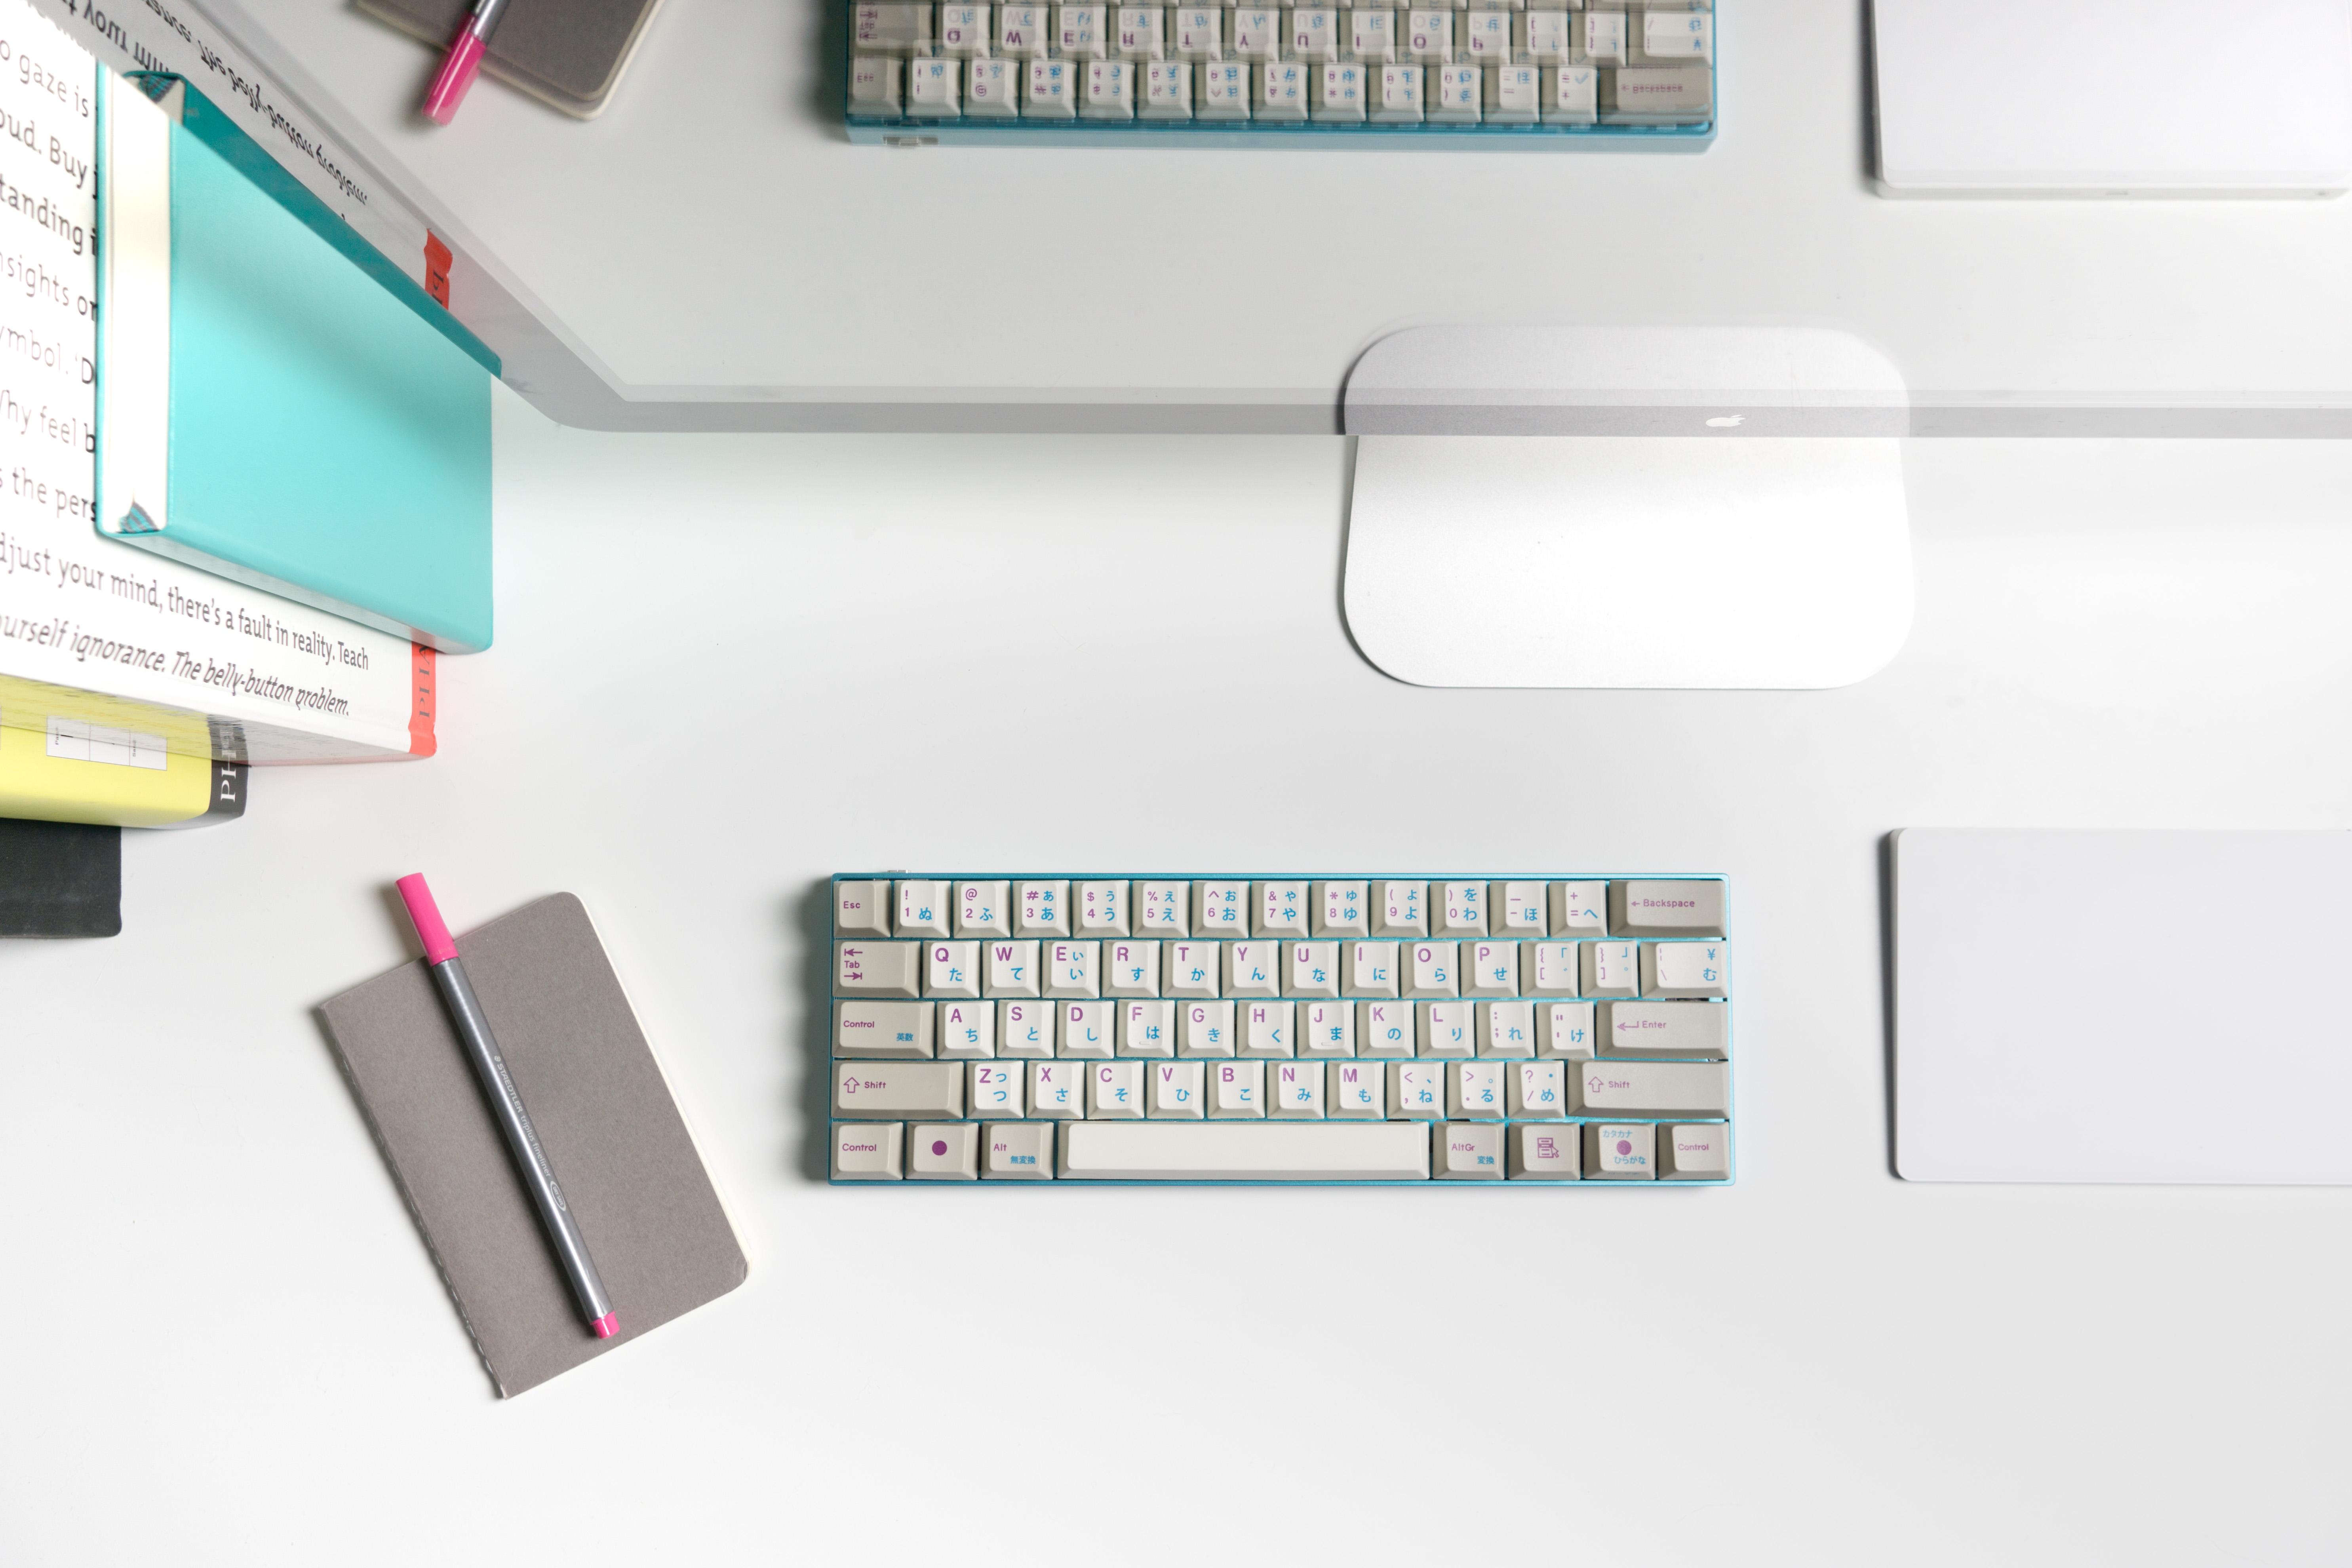 Custom Backlit Mechanical Keyboard - Ryan MacLean